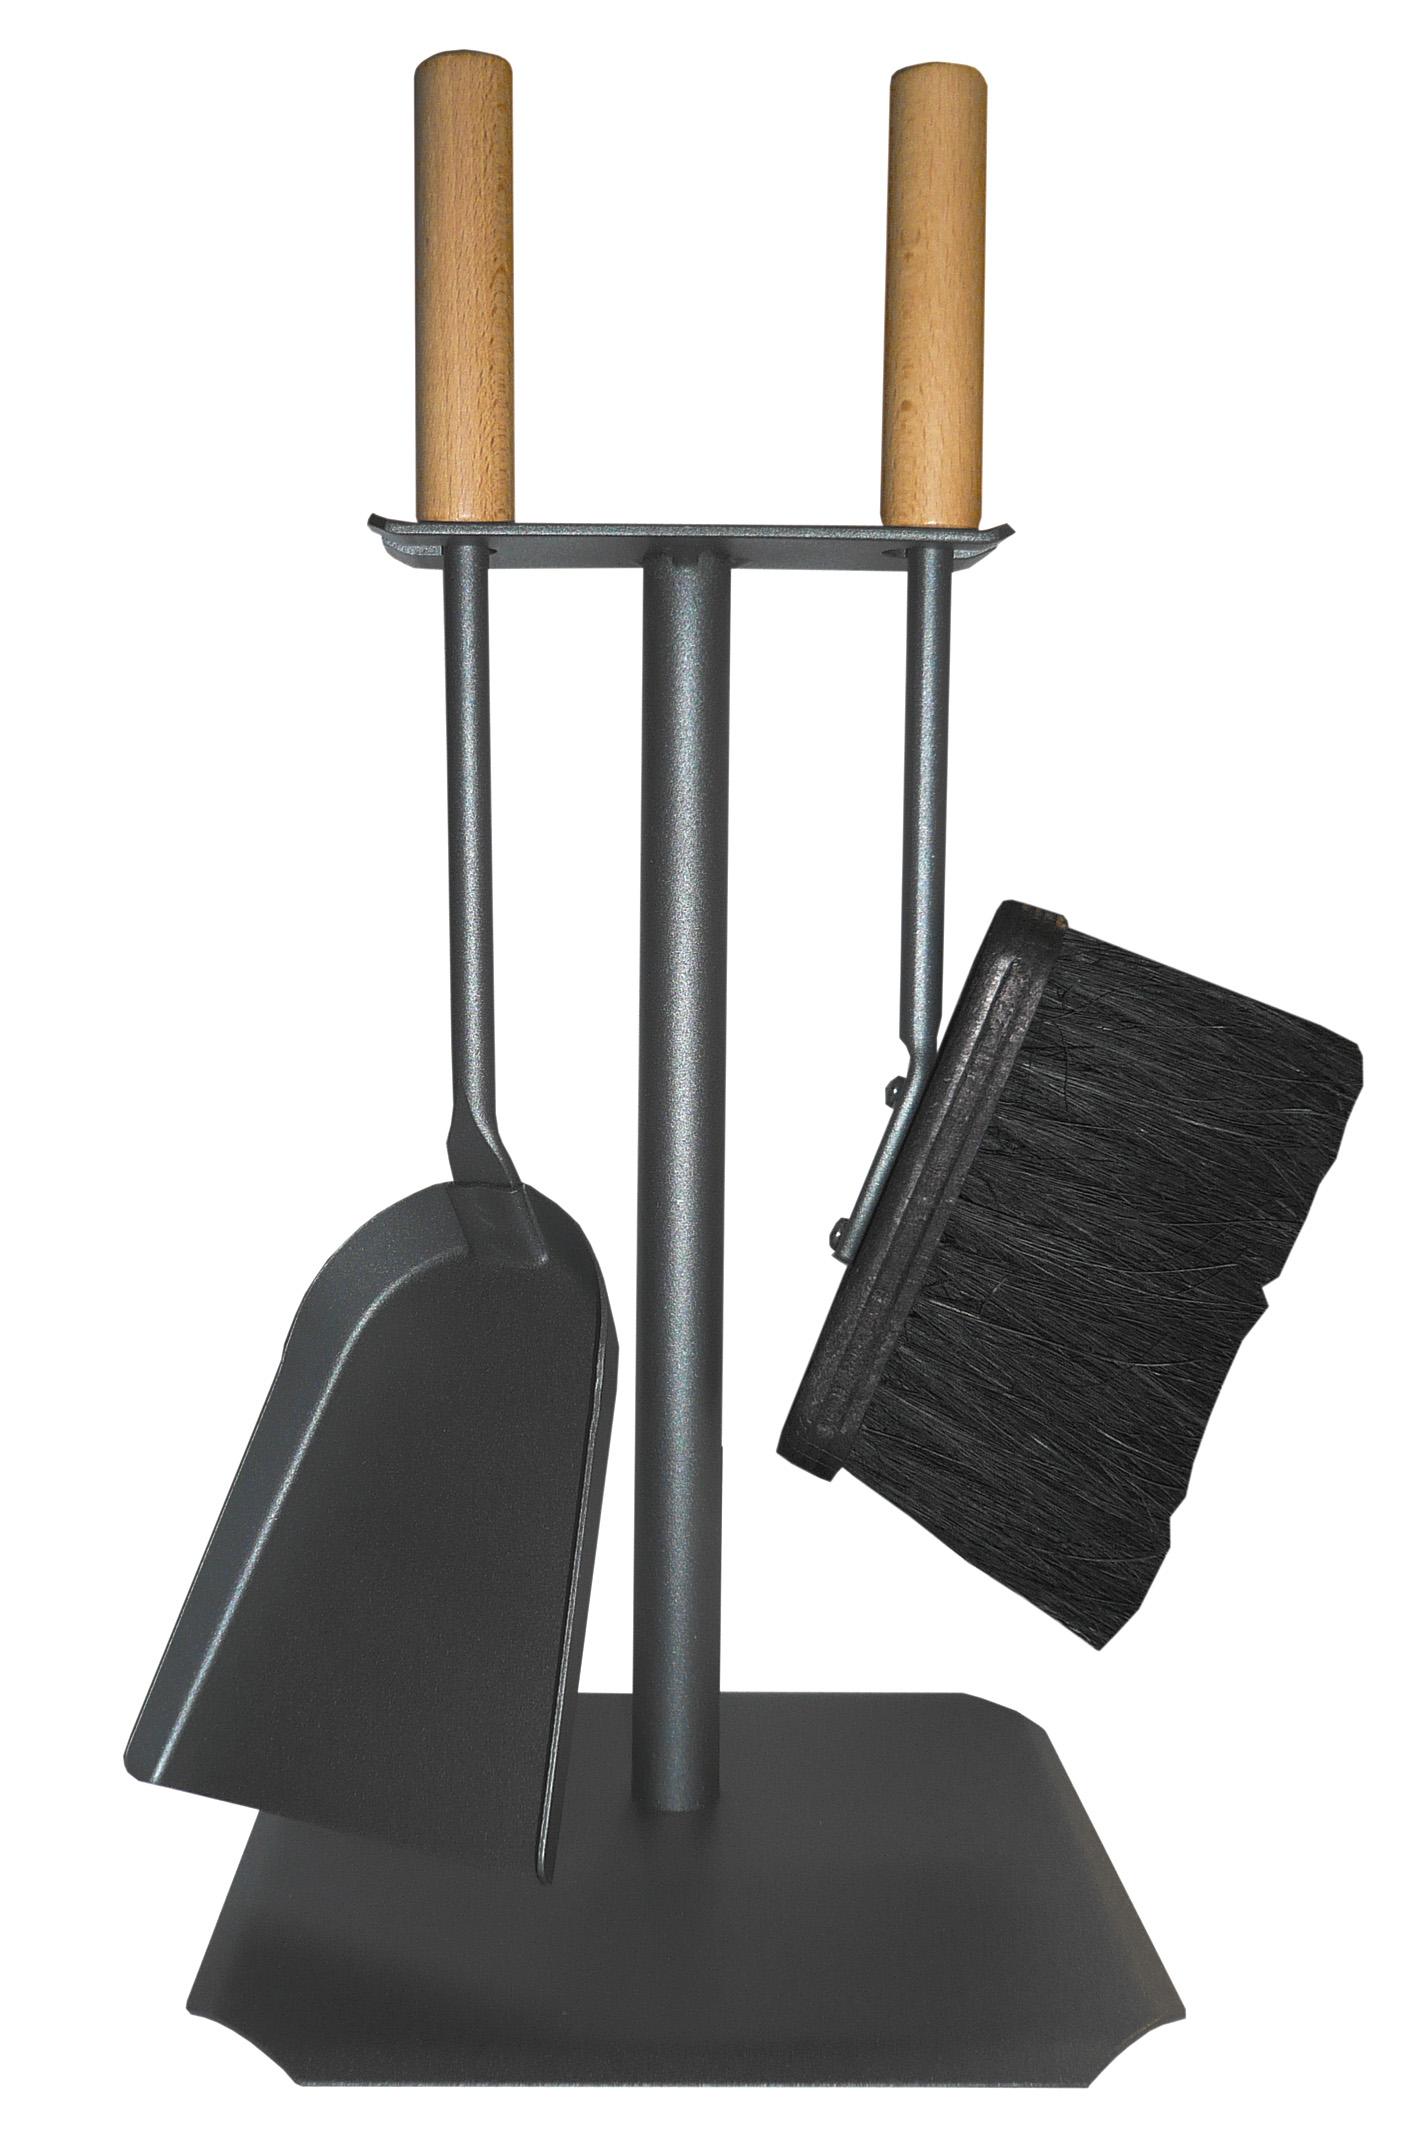 kaminbesteck lienbacher standard anthrazit 2teilig buchengriffe. Black Bedroom Furniture Sets. Home Design Ideas